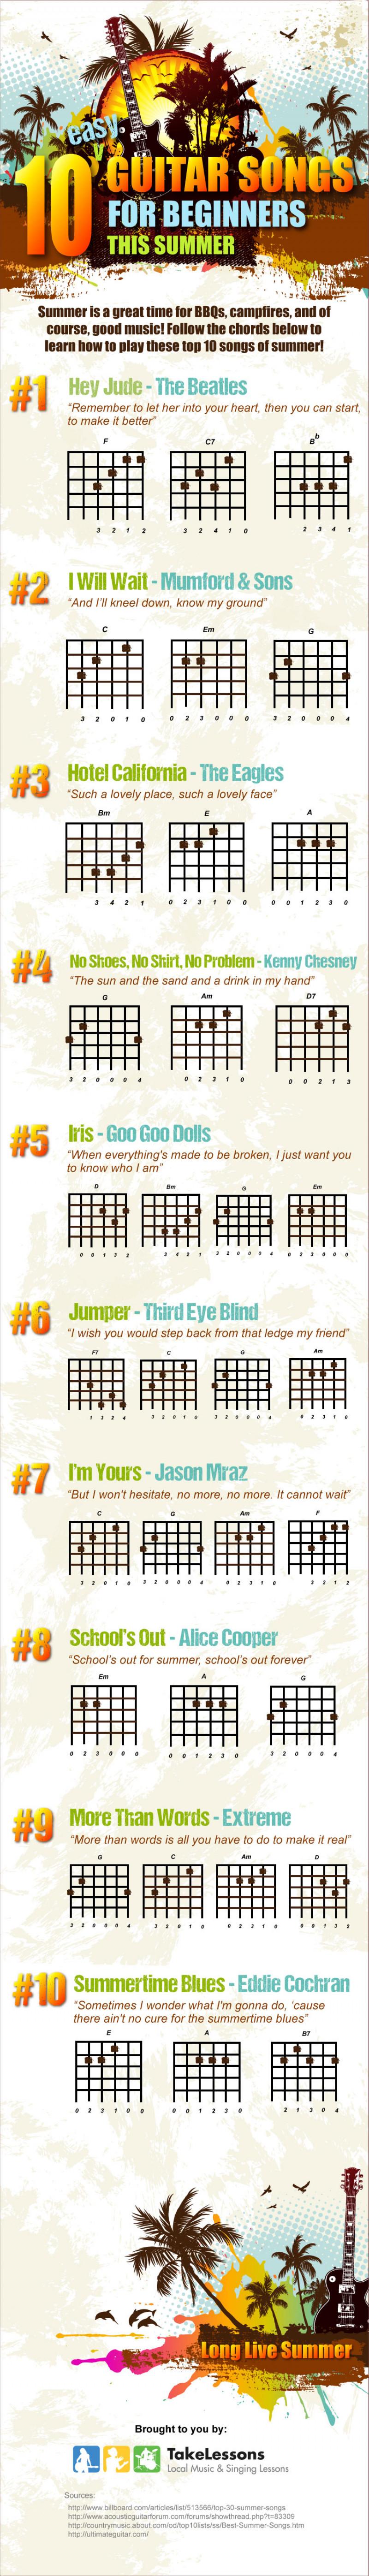 10 Guitar Songs for Beginners